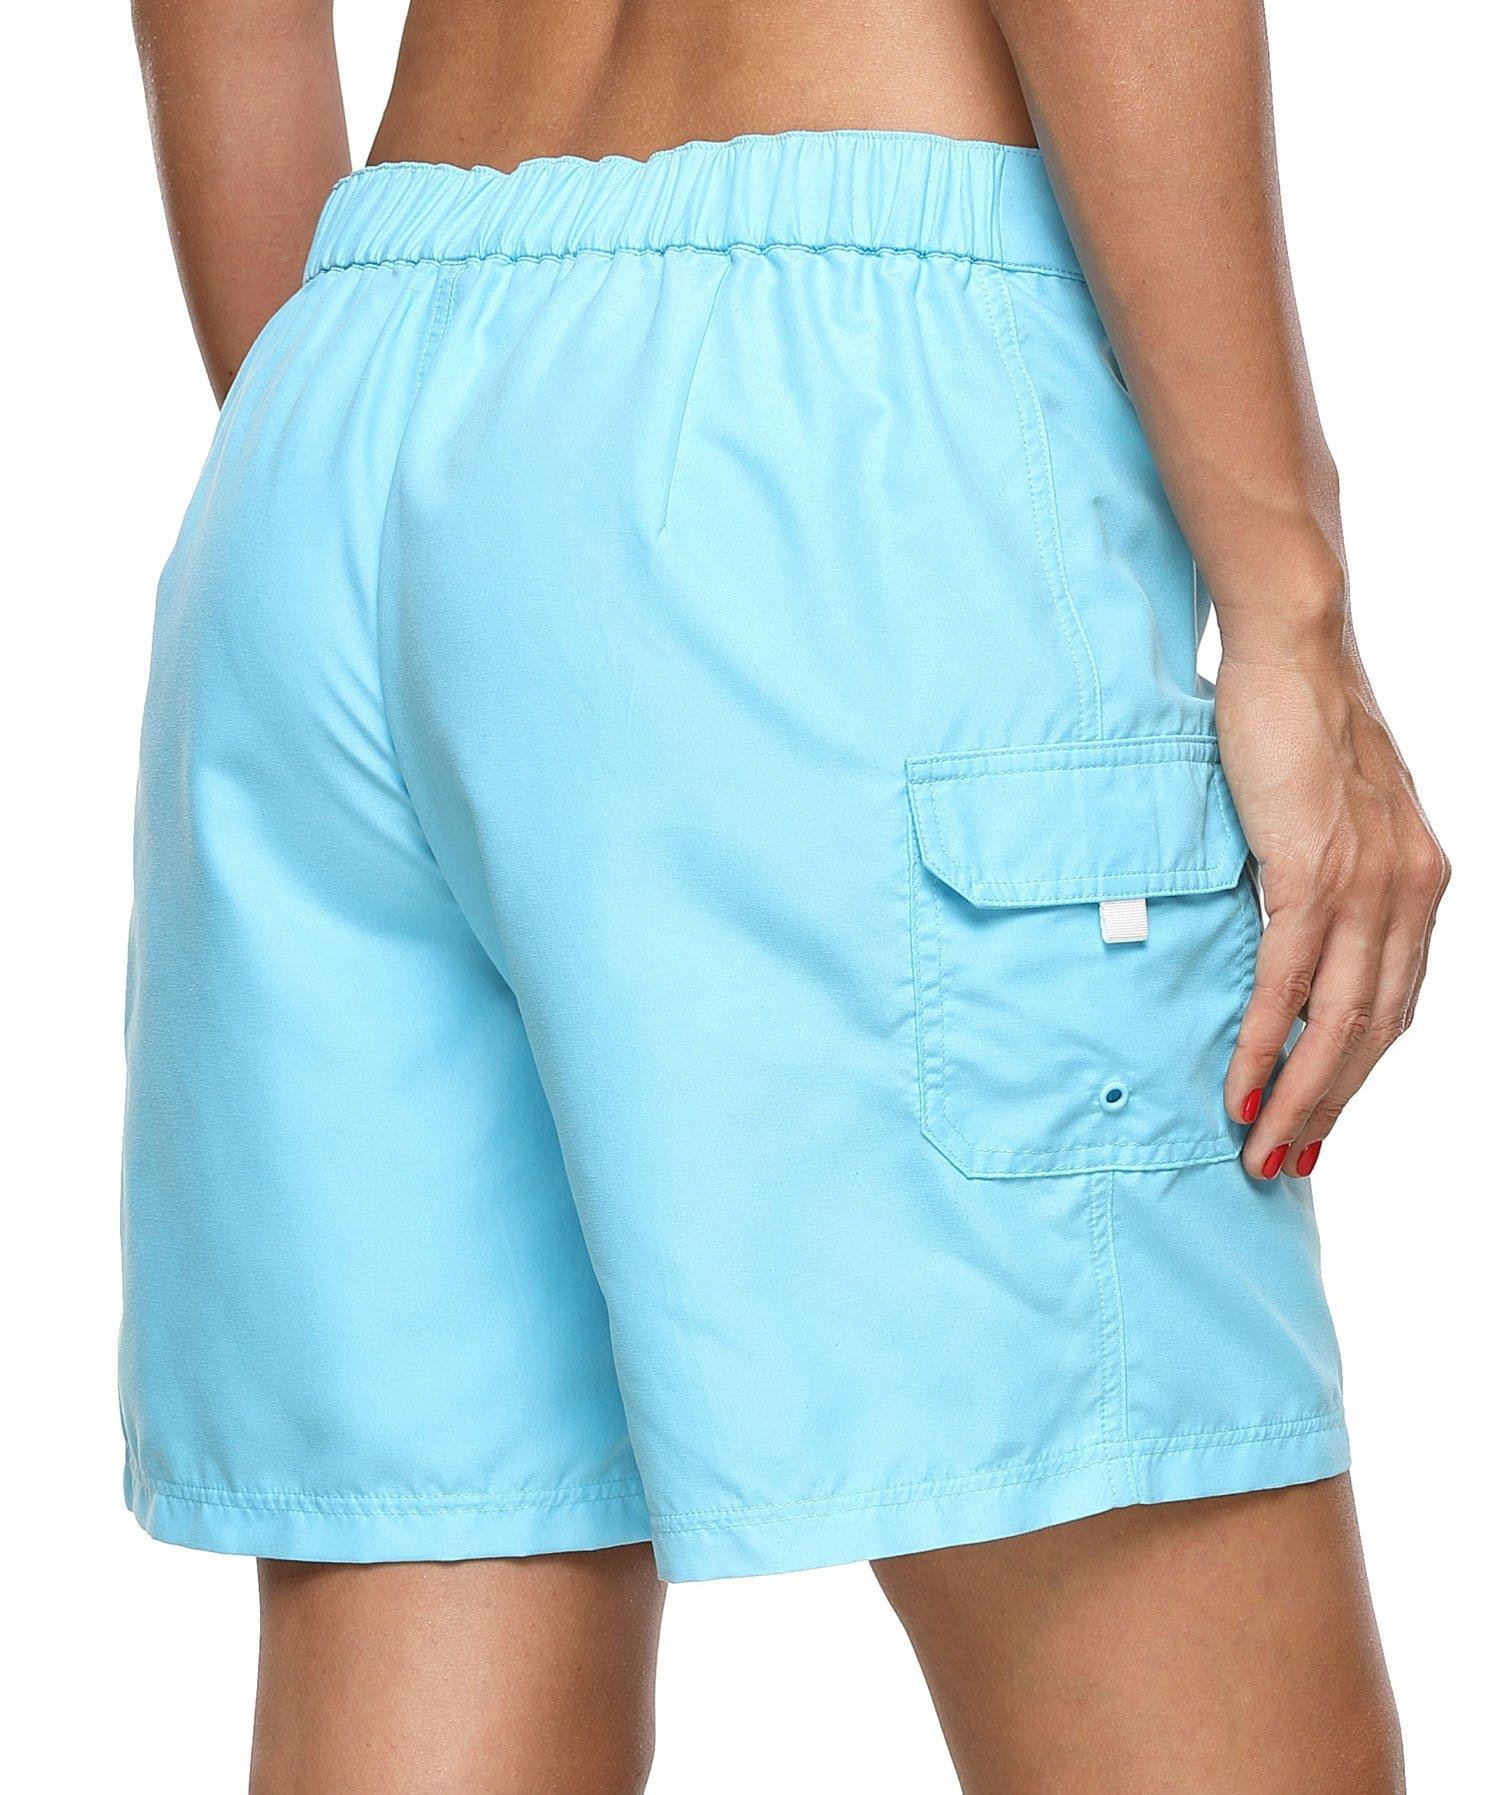 ATTRACO Women's Long Board Short Side Pocket Drawstring Swimwear Shorts Blue Large by ATTRACO (Image #4)